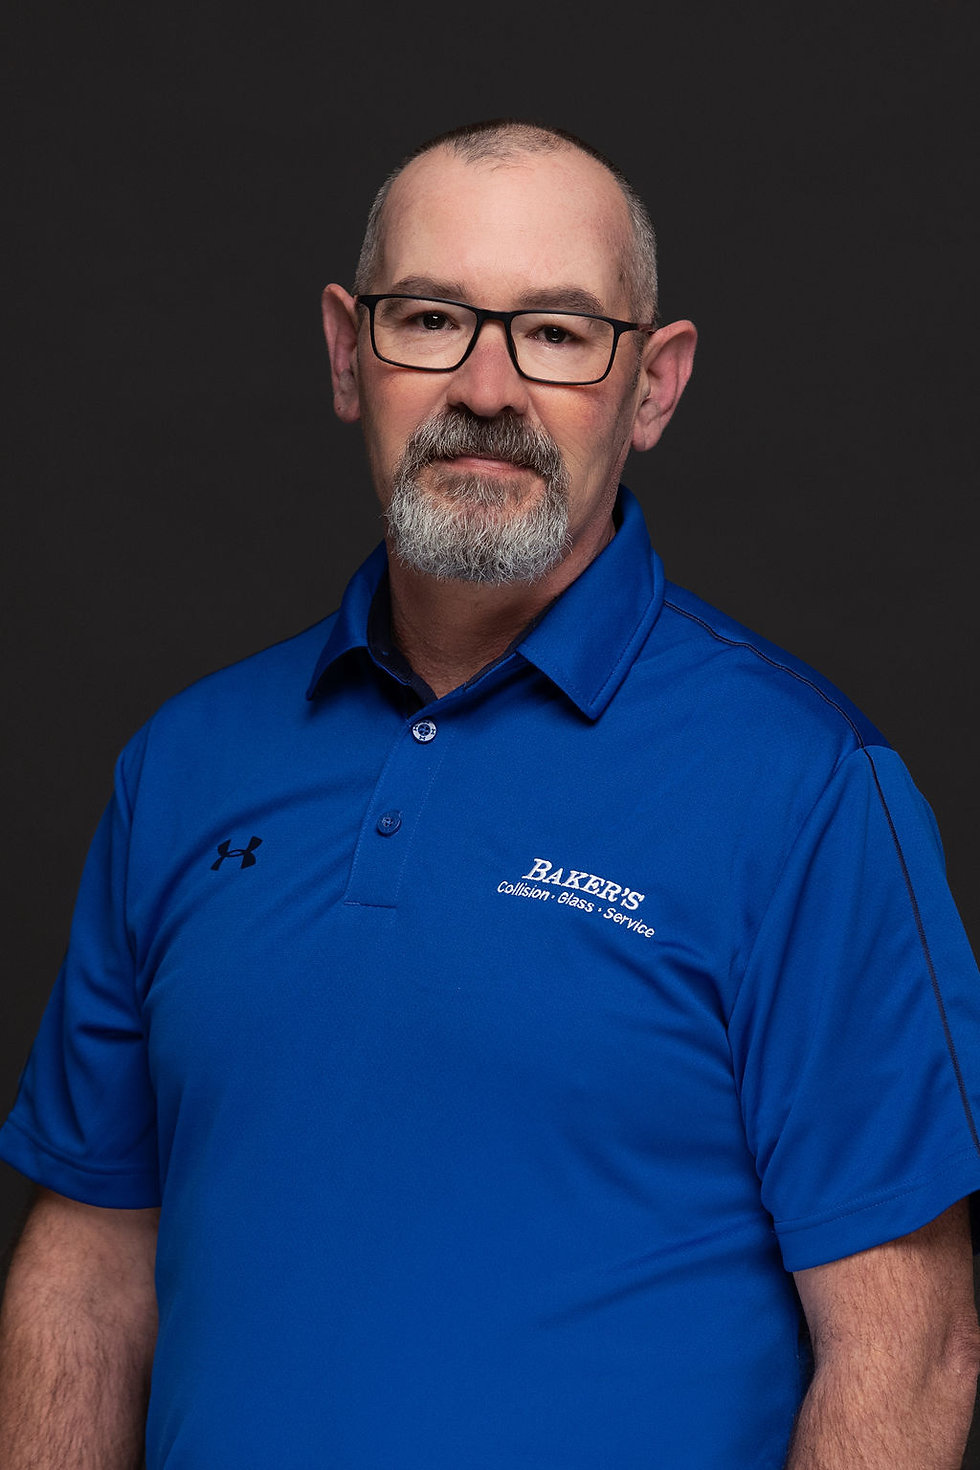 Jim Turk